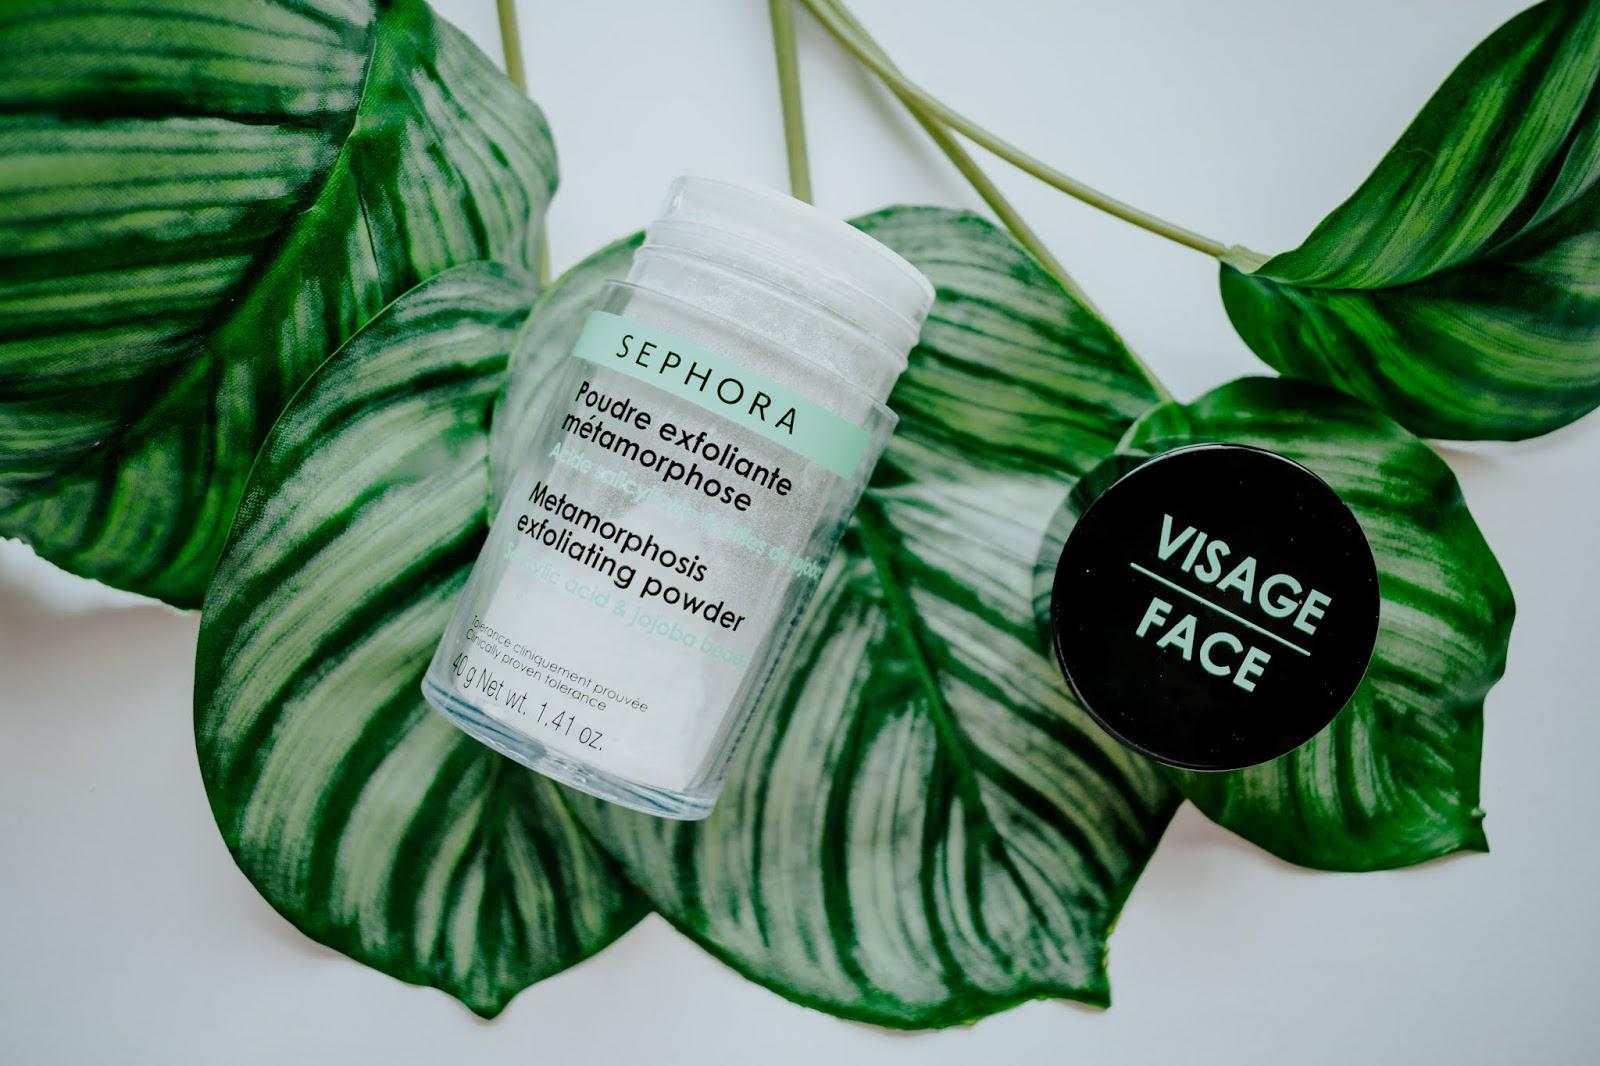 Metamophosis Exfoliating Powder Sephora exfoliante facial polvo